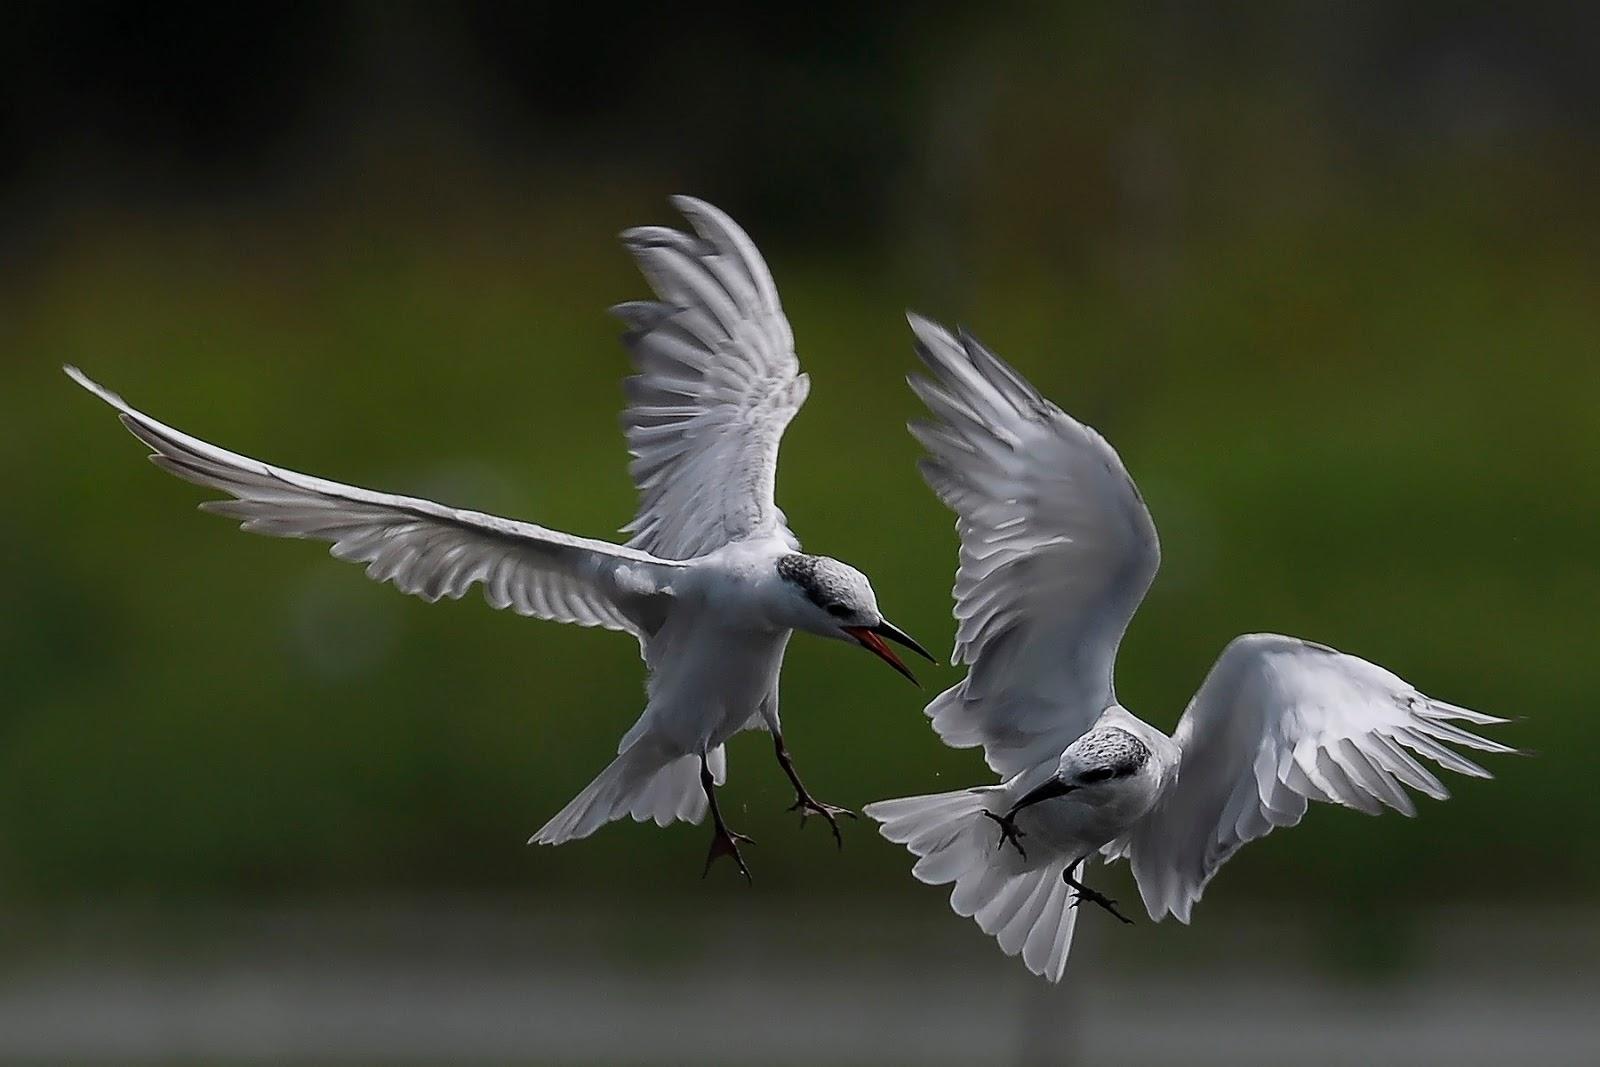 Download 900+  Gambar Burung Terbang Cantik  Terbaik Free